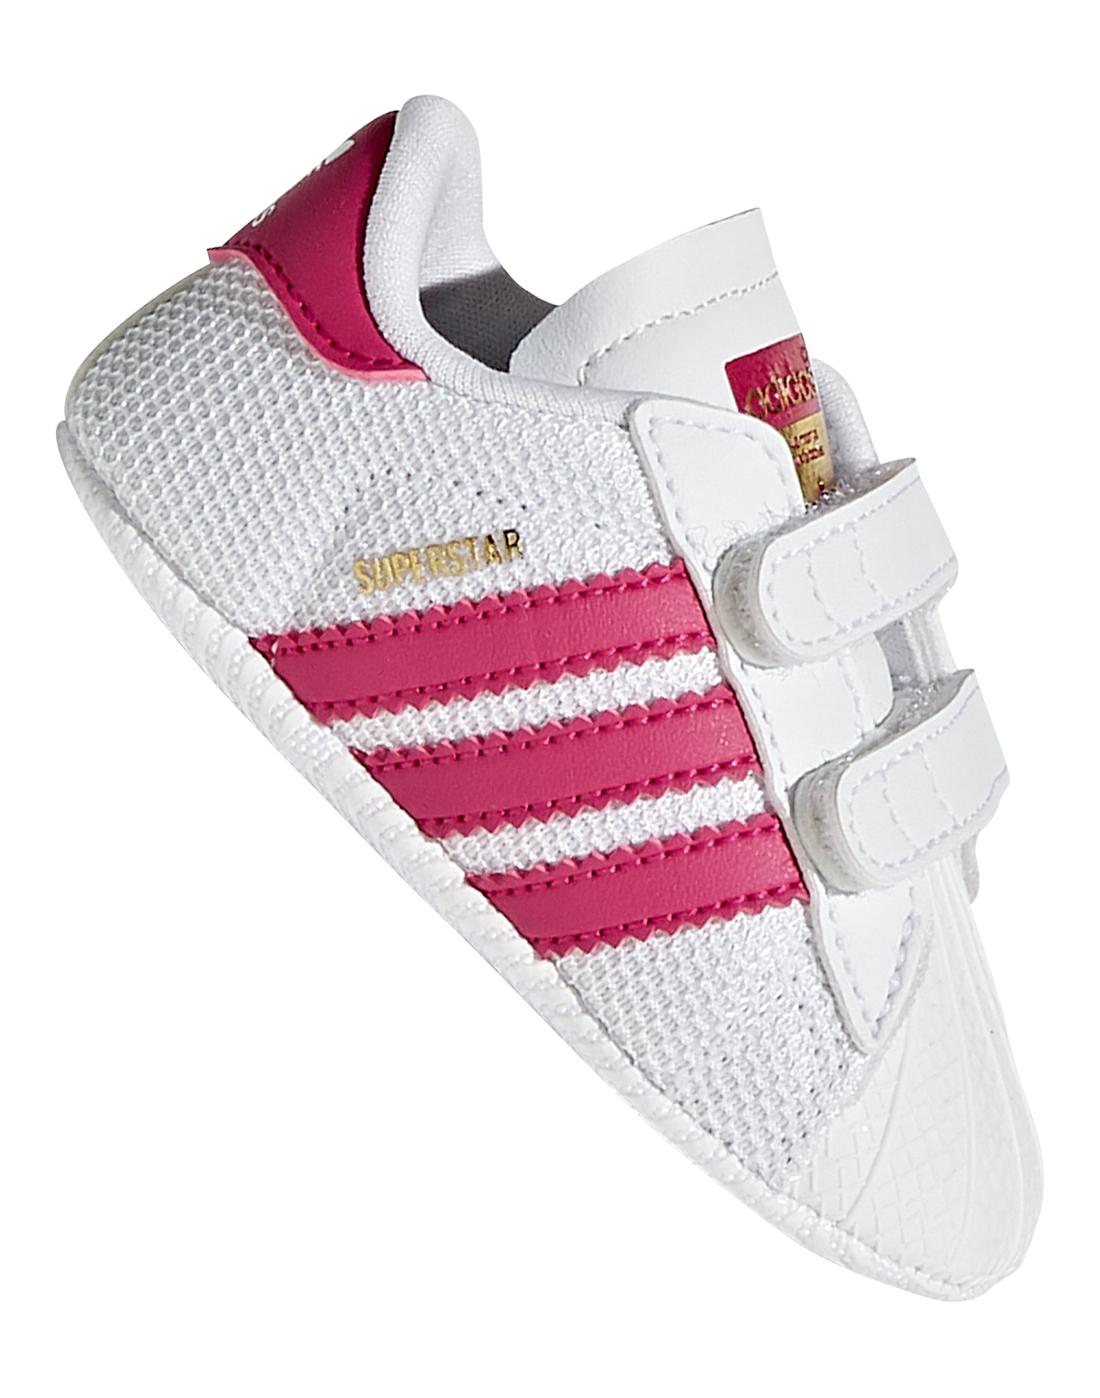 8de8e9176d2 adidas Originals. Infant Superstar Crib. Infant Superstar Crib ...